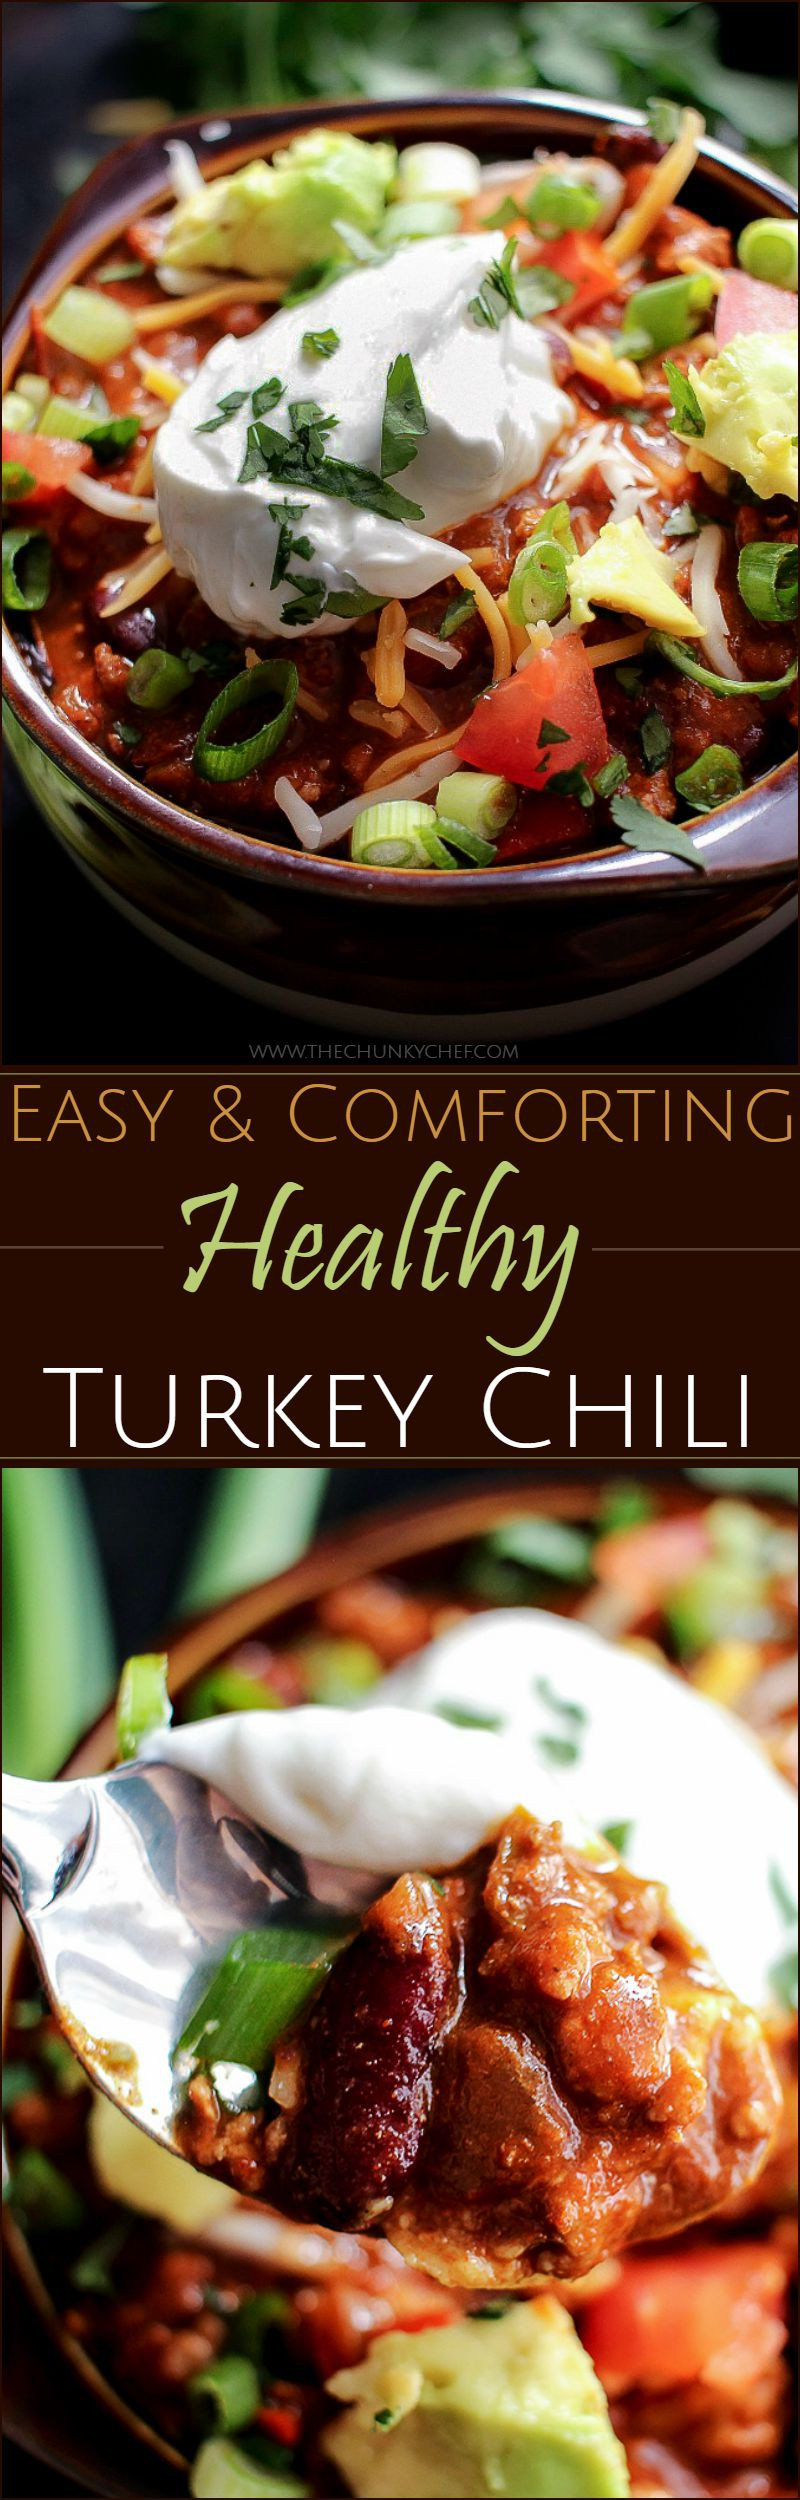 Heart Healthy Turkey Chili  Heart Healthy Turkey Chili The Chunky Chef